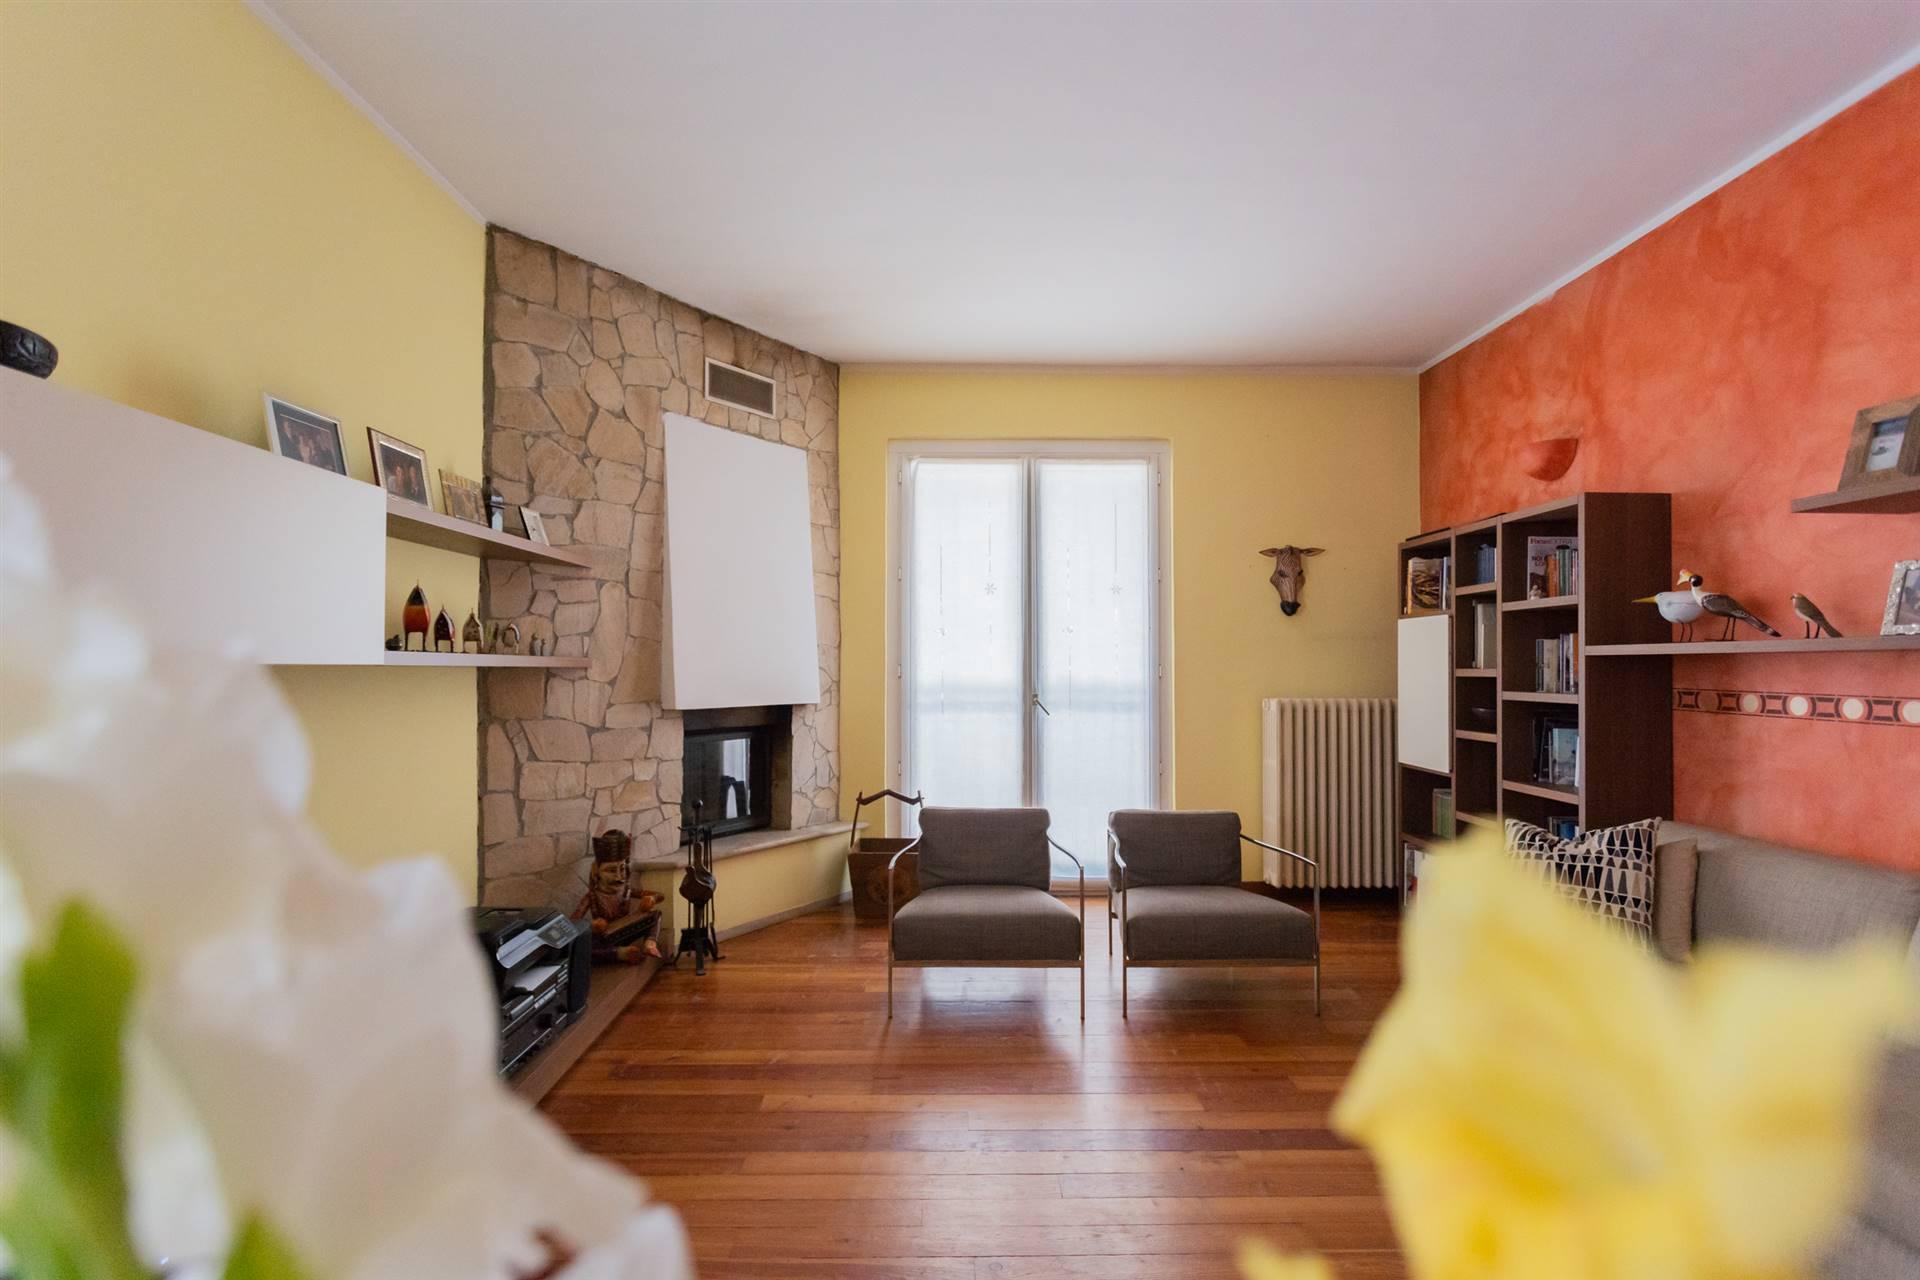 Appartamento in Vendita a Usmate Velate: 4 locali, 120 mq